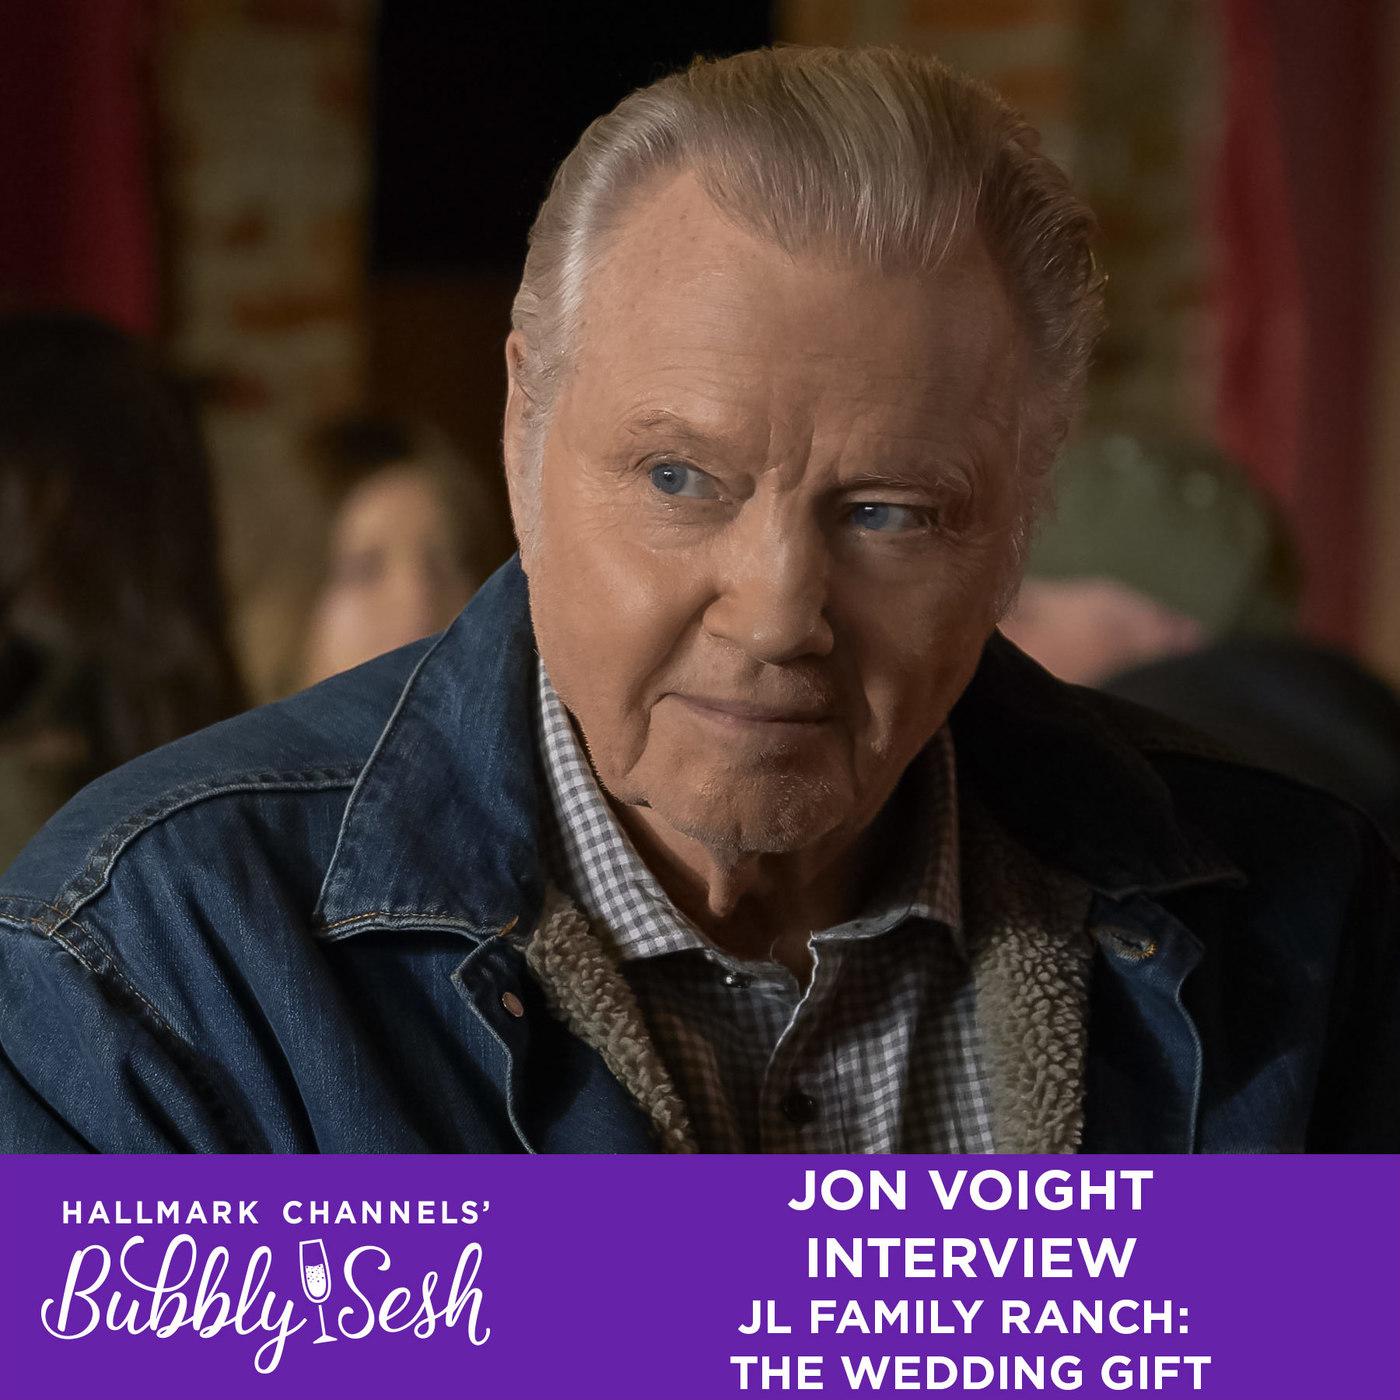 Jon Voight Interview, JL Family Ranch: The Wedding Gift